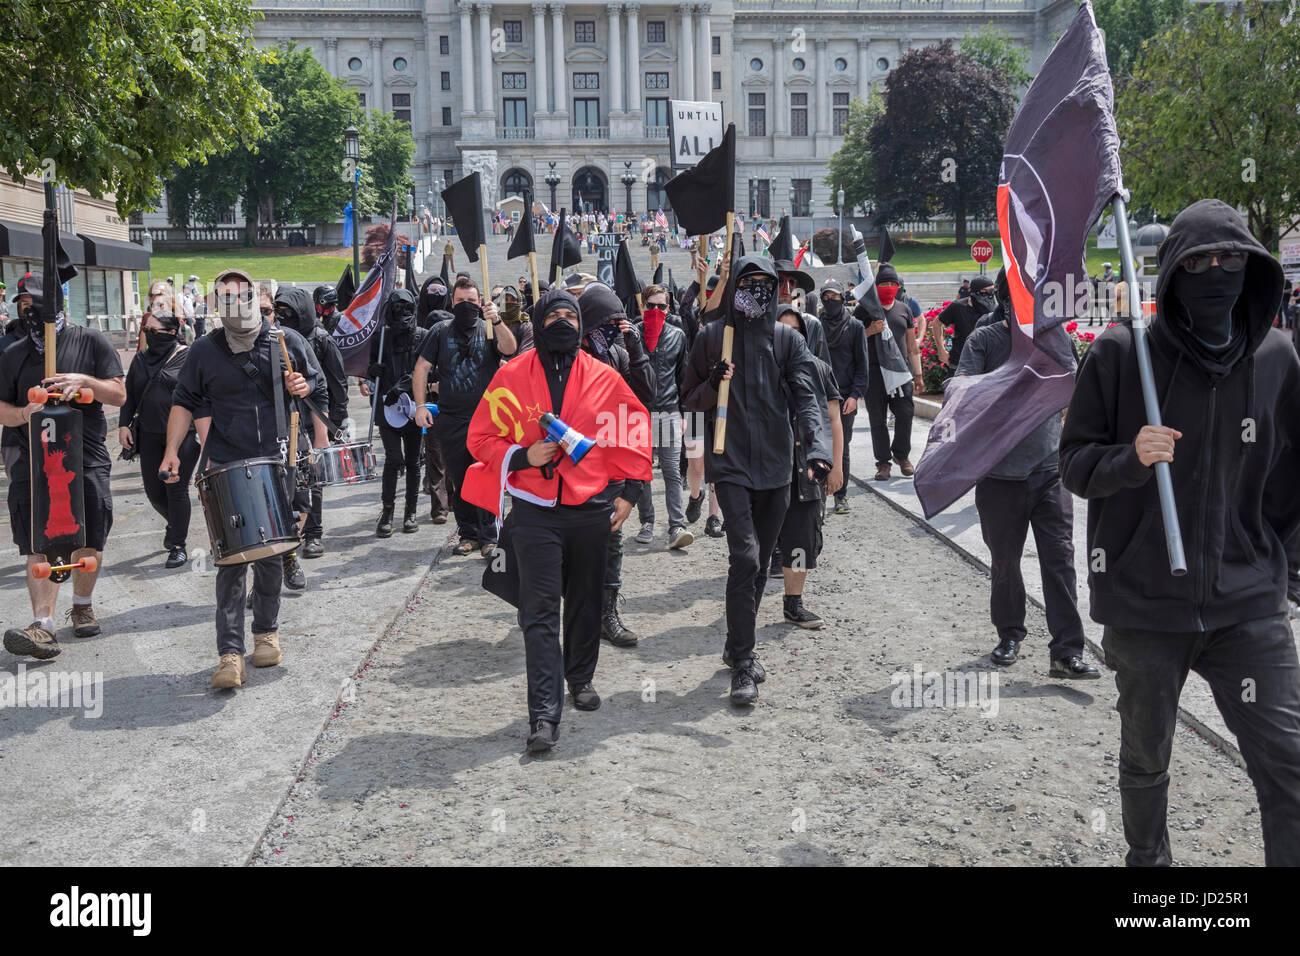 Harrisburg, Pennsylvania - Black Bloc anarchists counter-demonstrate against an anti-Muslim, anti-sharia rally organized - Stock Image